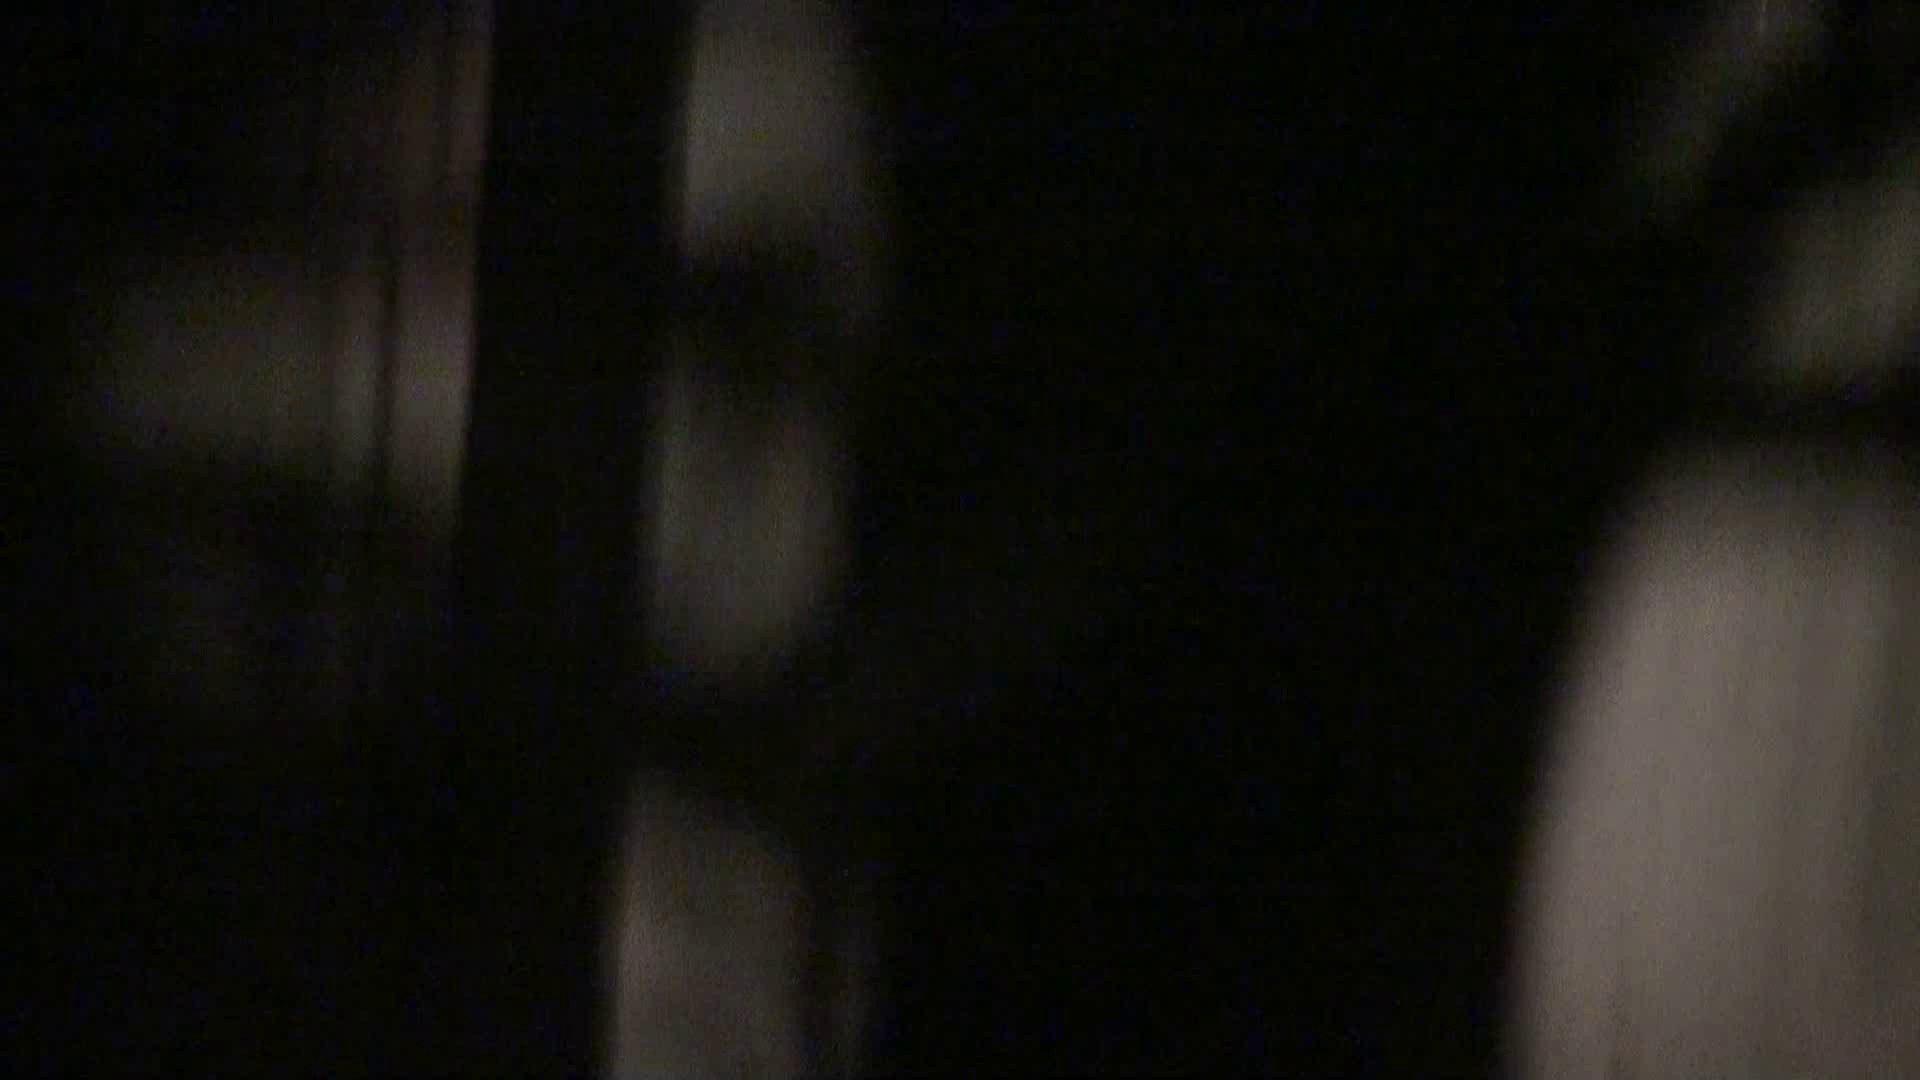 Aquaな露天風呂Vol.426 盗撮師作品 | 露天風呂突入  70pic 19